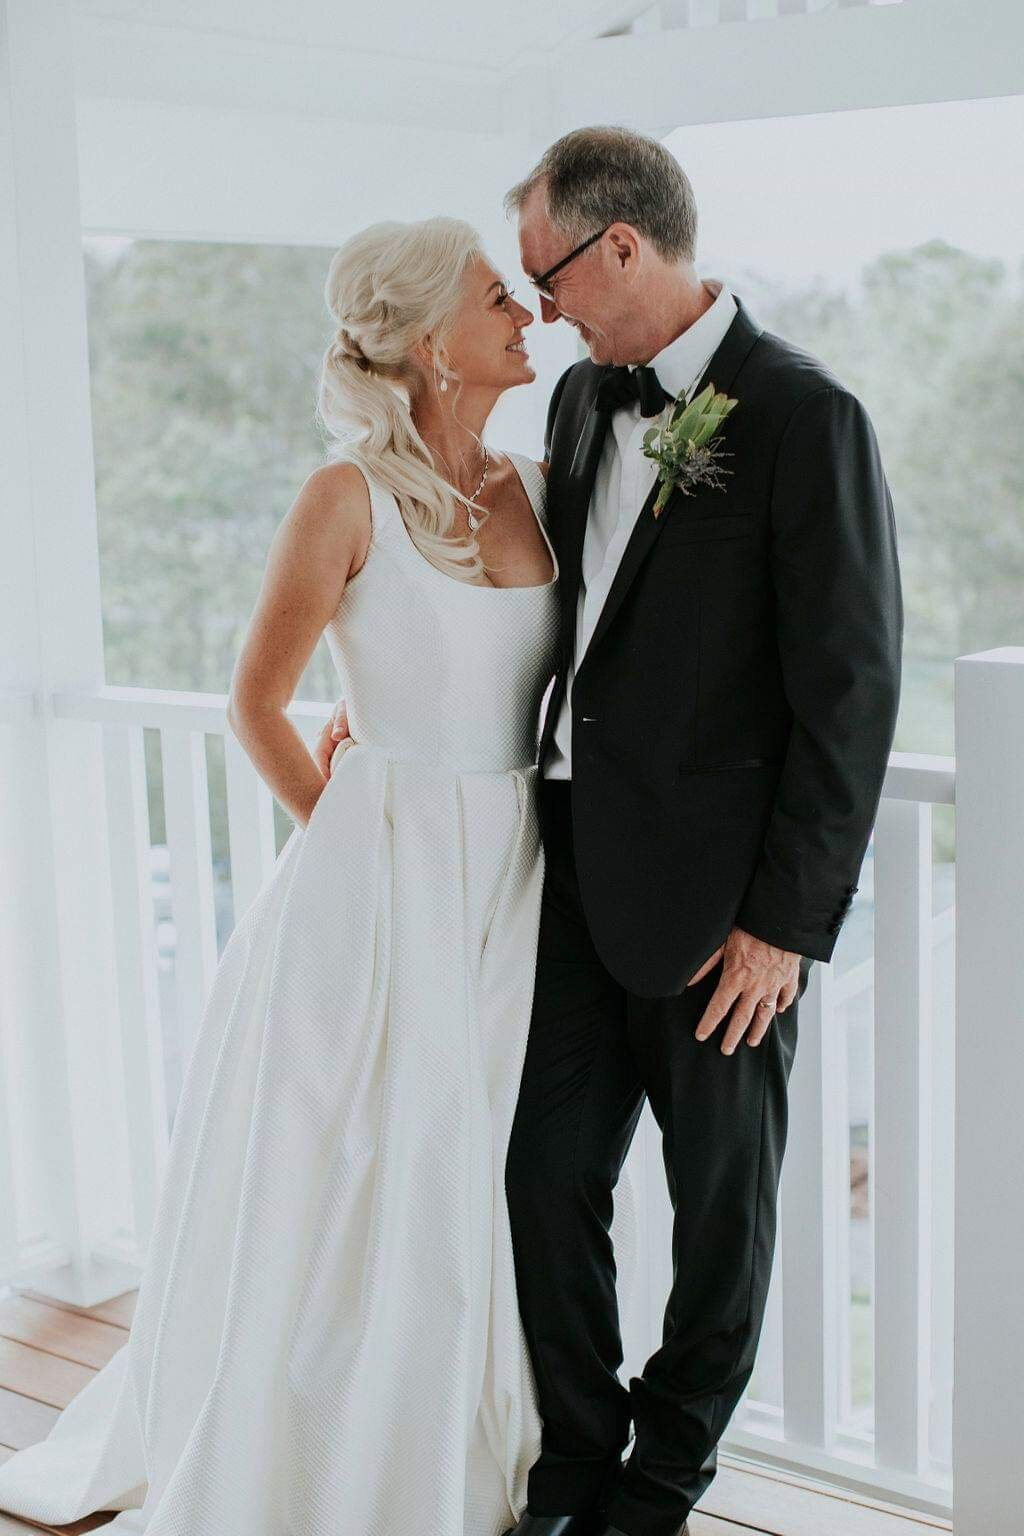 bespoke-bridal-shop-designer-helena-couture-designs-custom-wedding-dresses-gold-coast-brisbane-affordable-suzie11